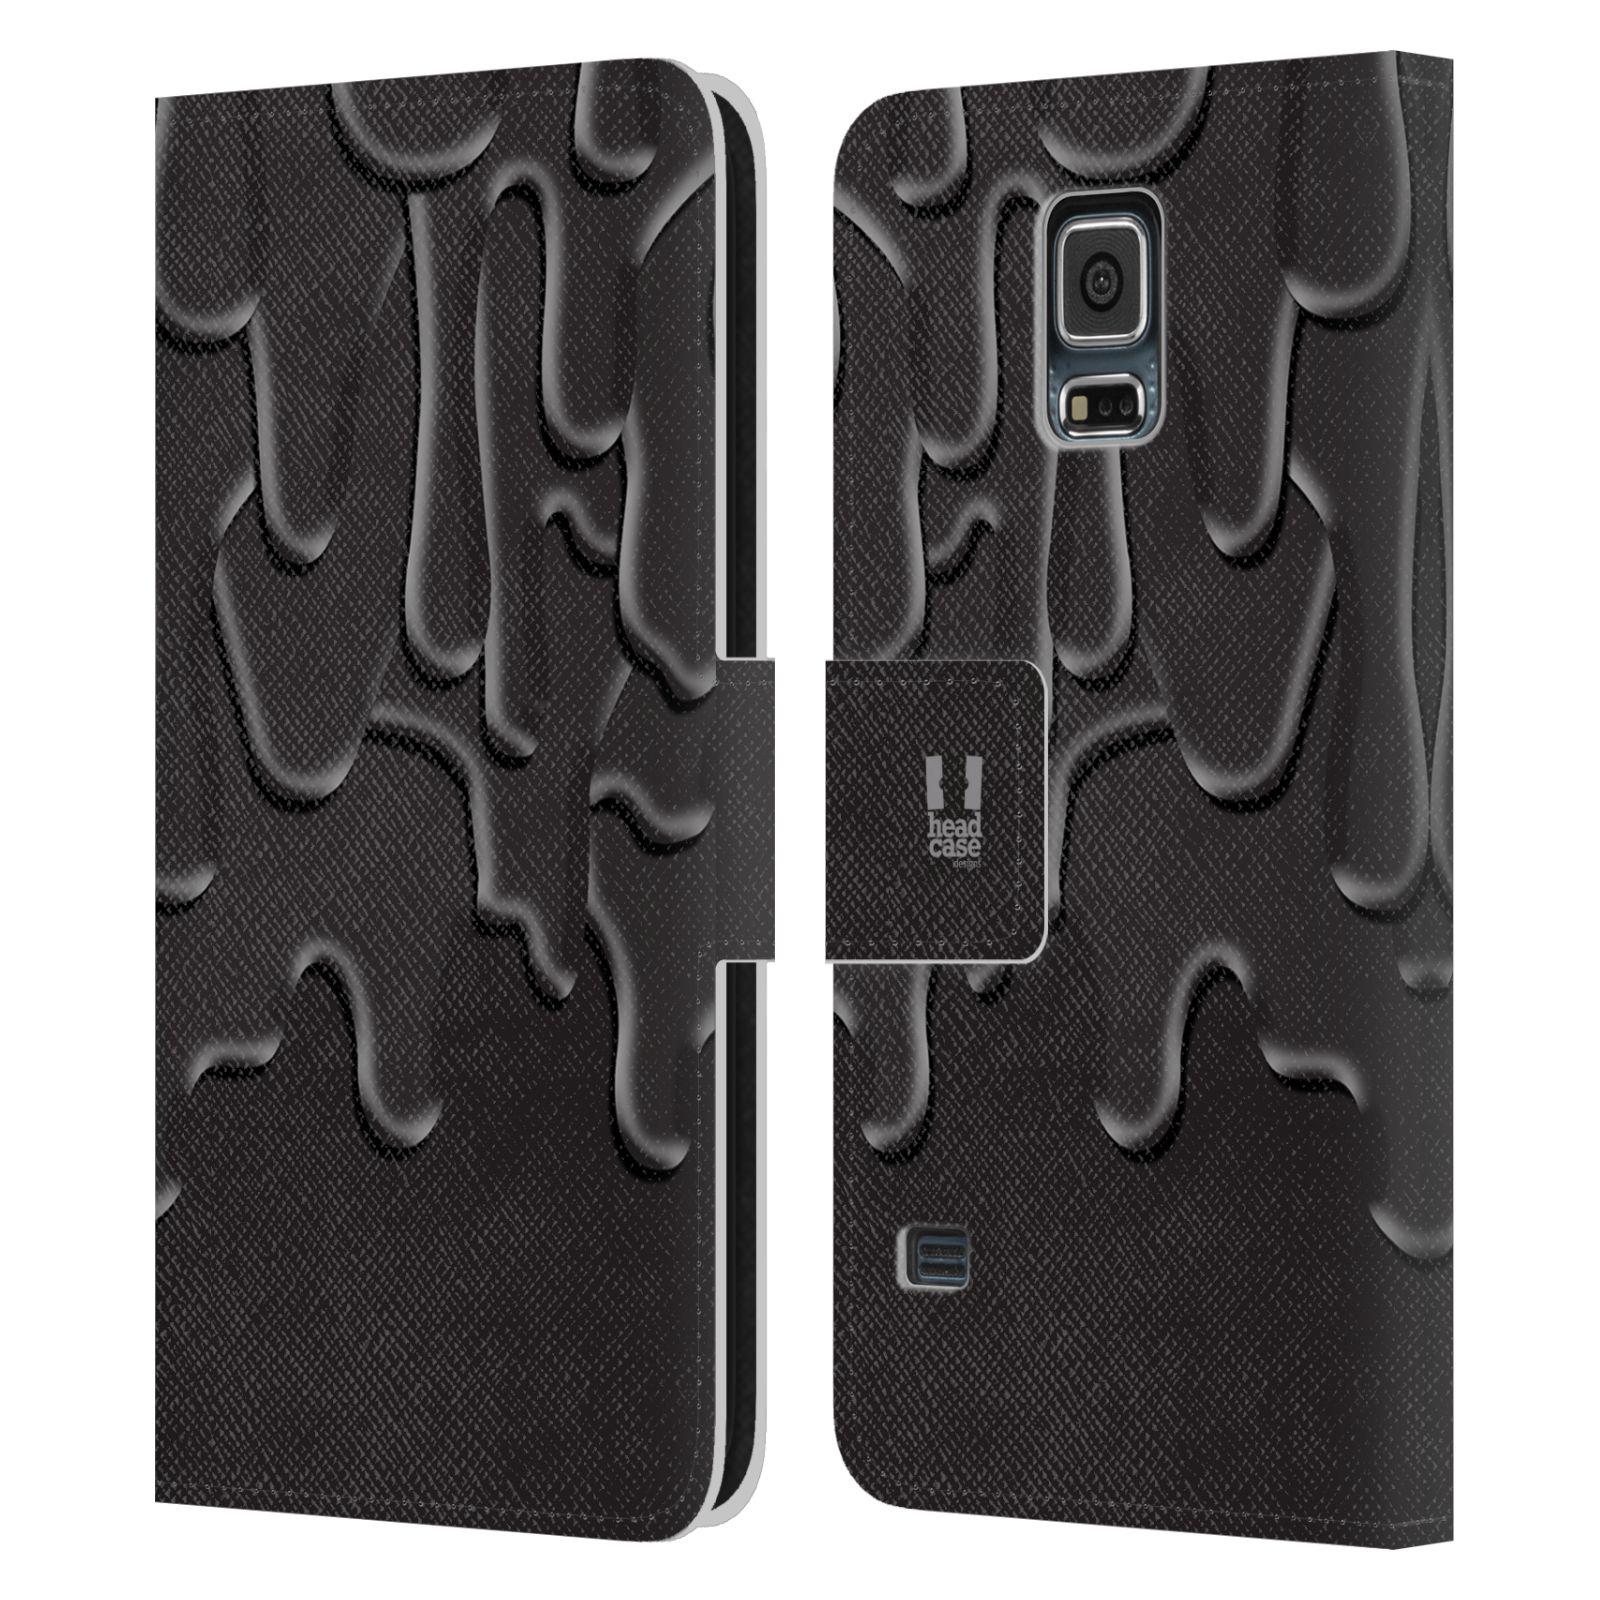 HEAD CASE Flipové pouzdro pro mobil Samsung Galaxy S5 / S5 NEO ZÁPLAVA BARVA černá